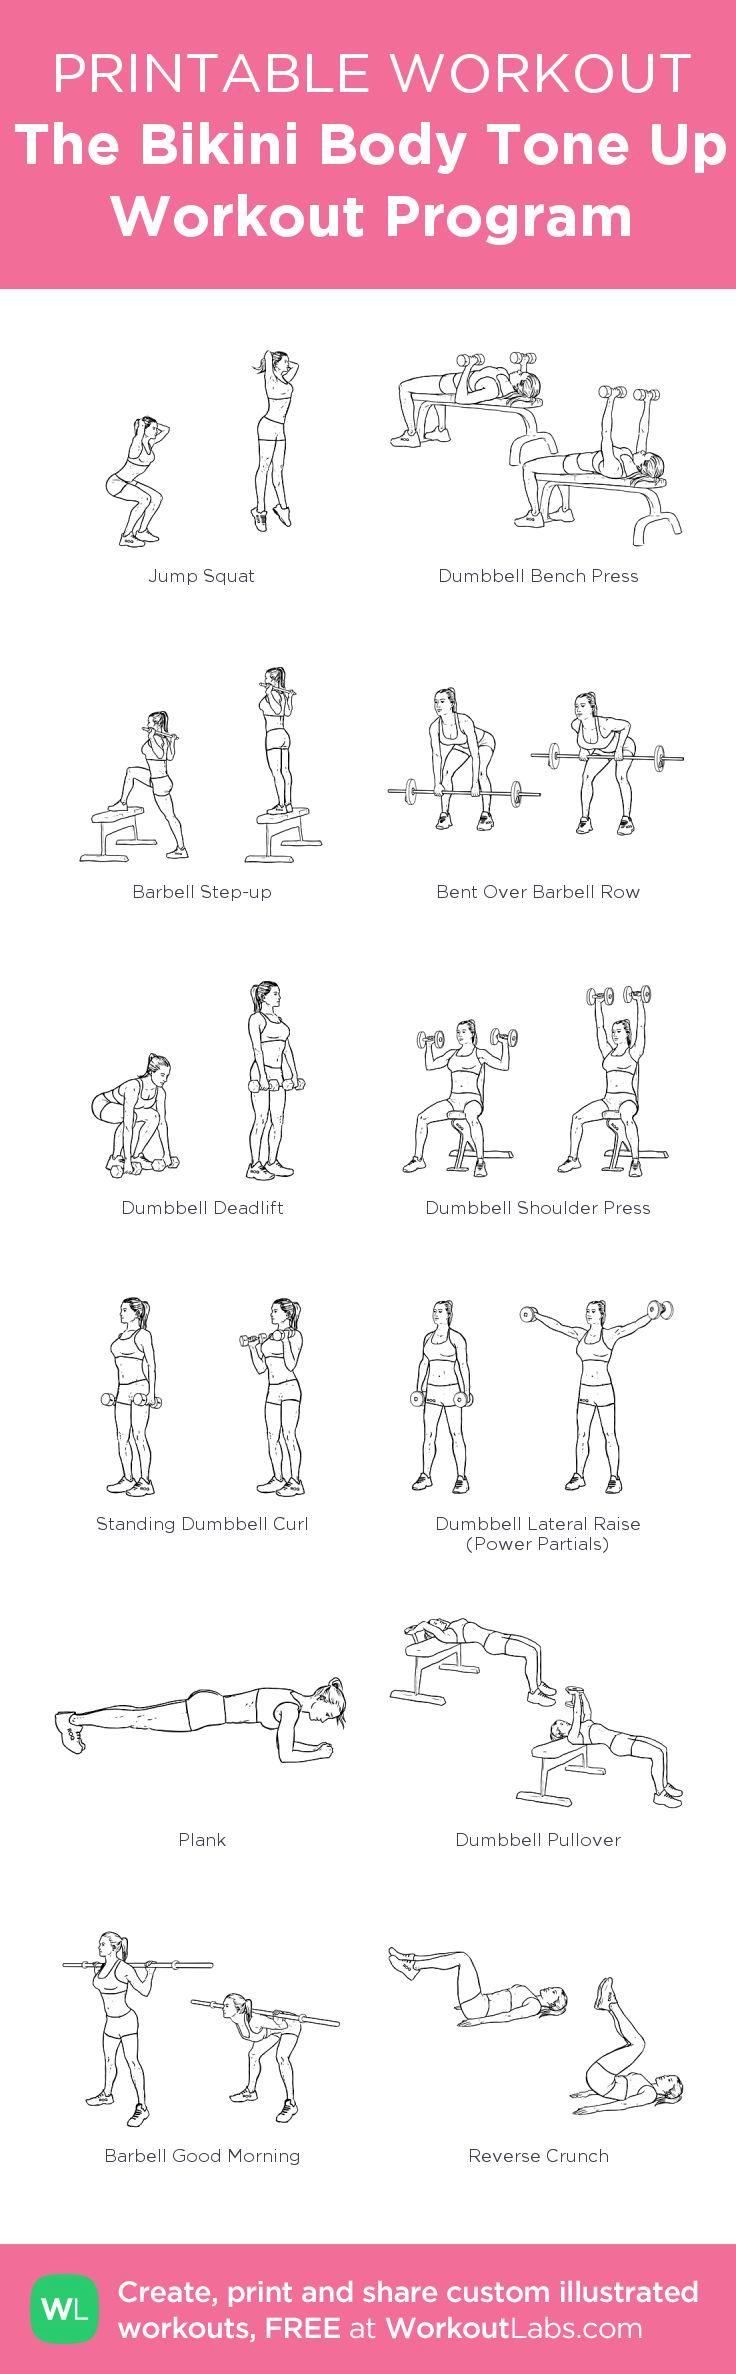 The Bikini Body Tone Up Workout Program:my custom printable workout by @WorkoutLabs #workoutlabs #customworkout